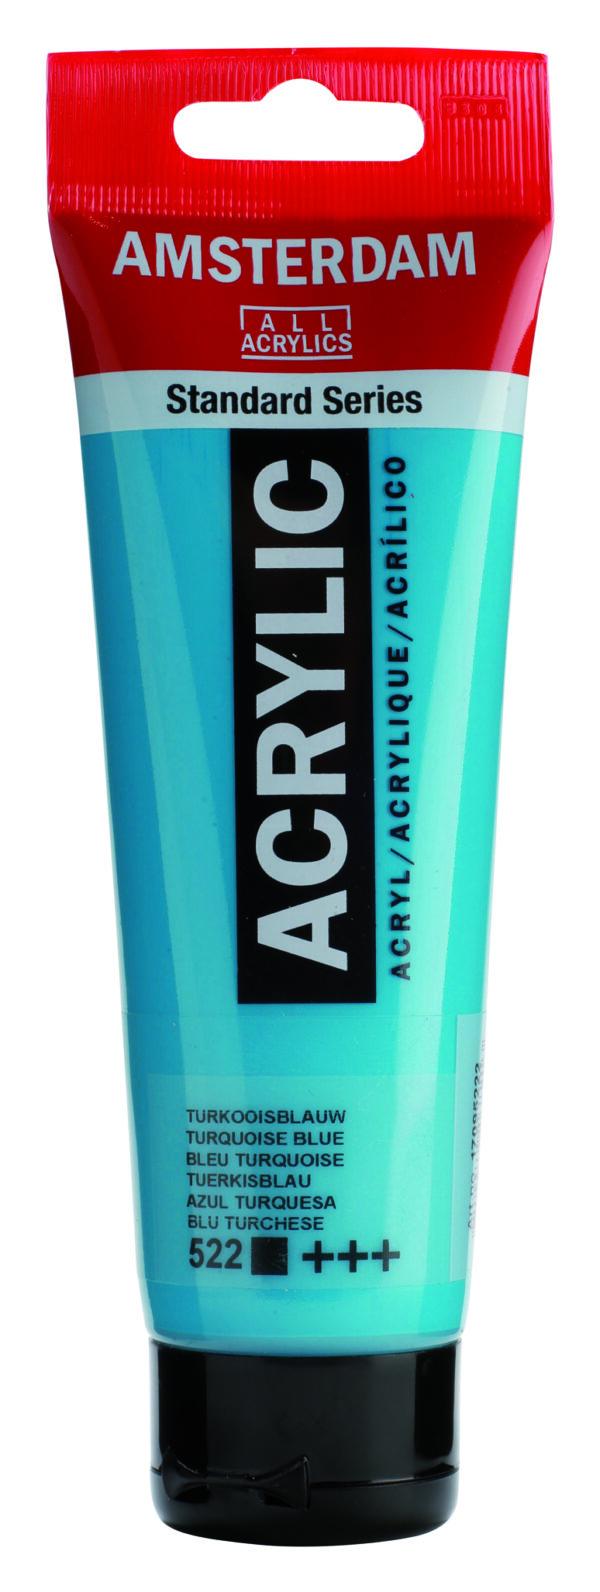 Ams std 522 Turquoise blue - 120 ml